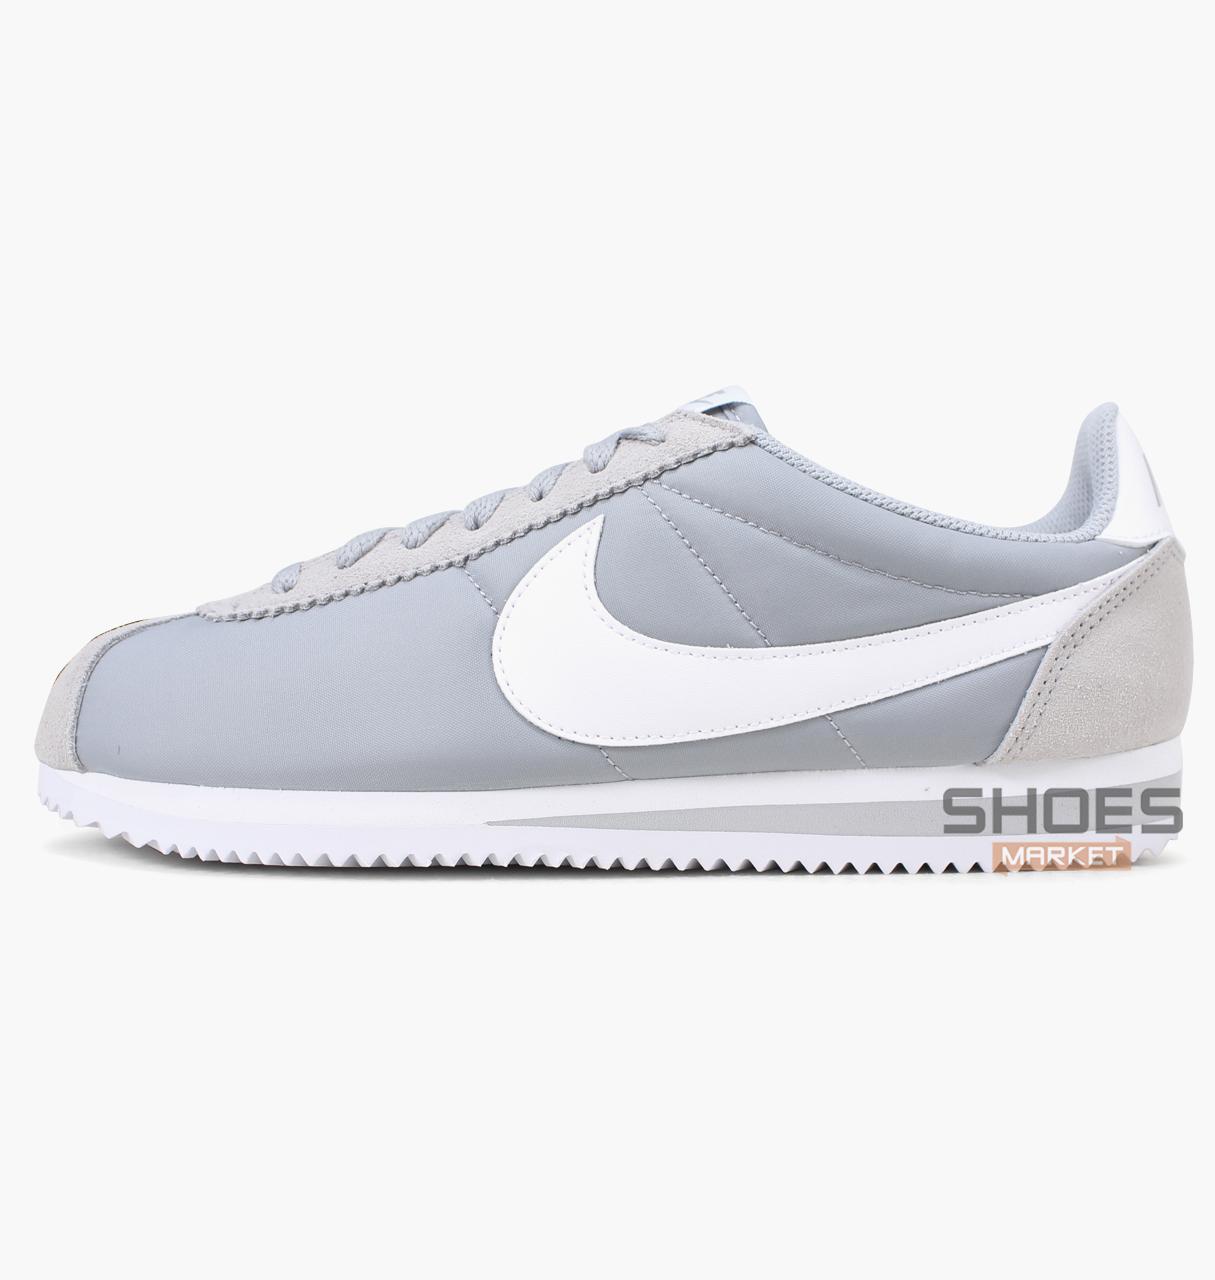 8658dc95 Мужские кроссовки Nike Classic Cortez Nylon Grey 807472-010, оригинал -  Интернет-магазин